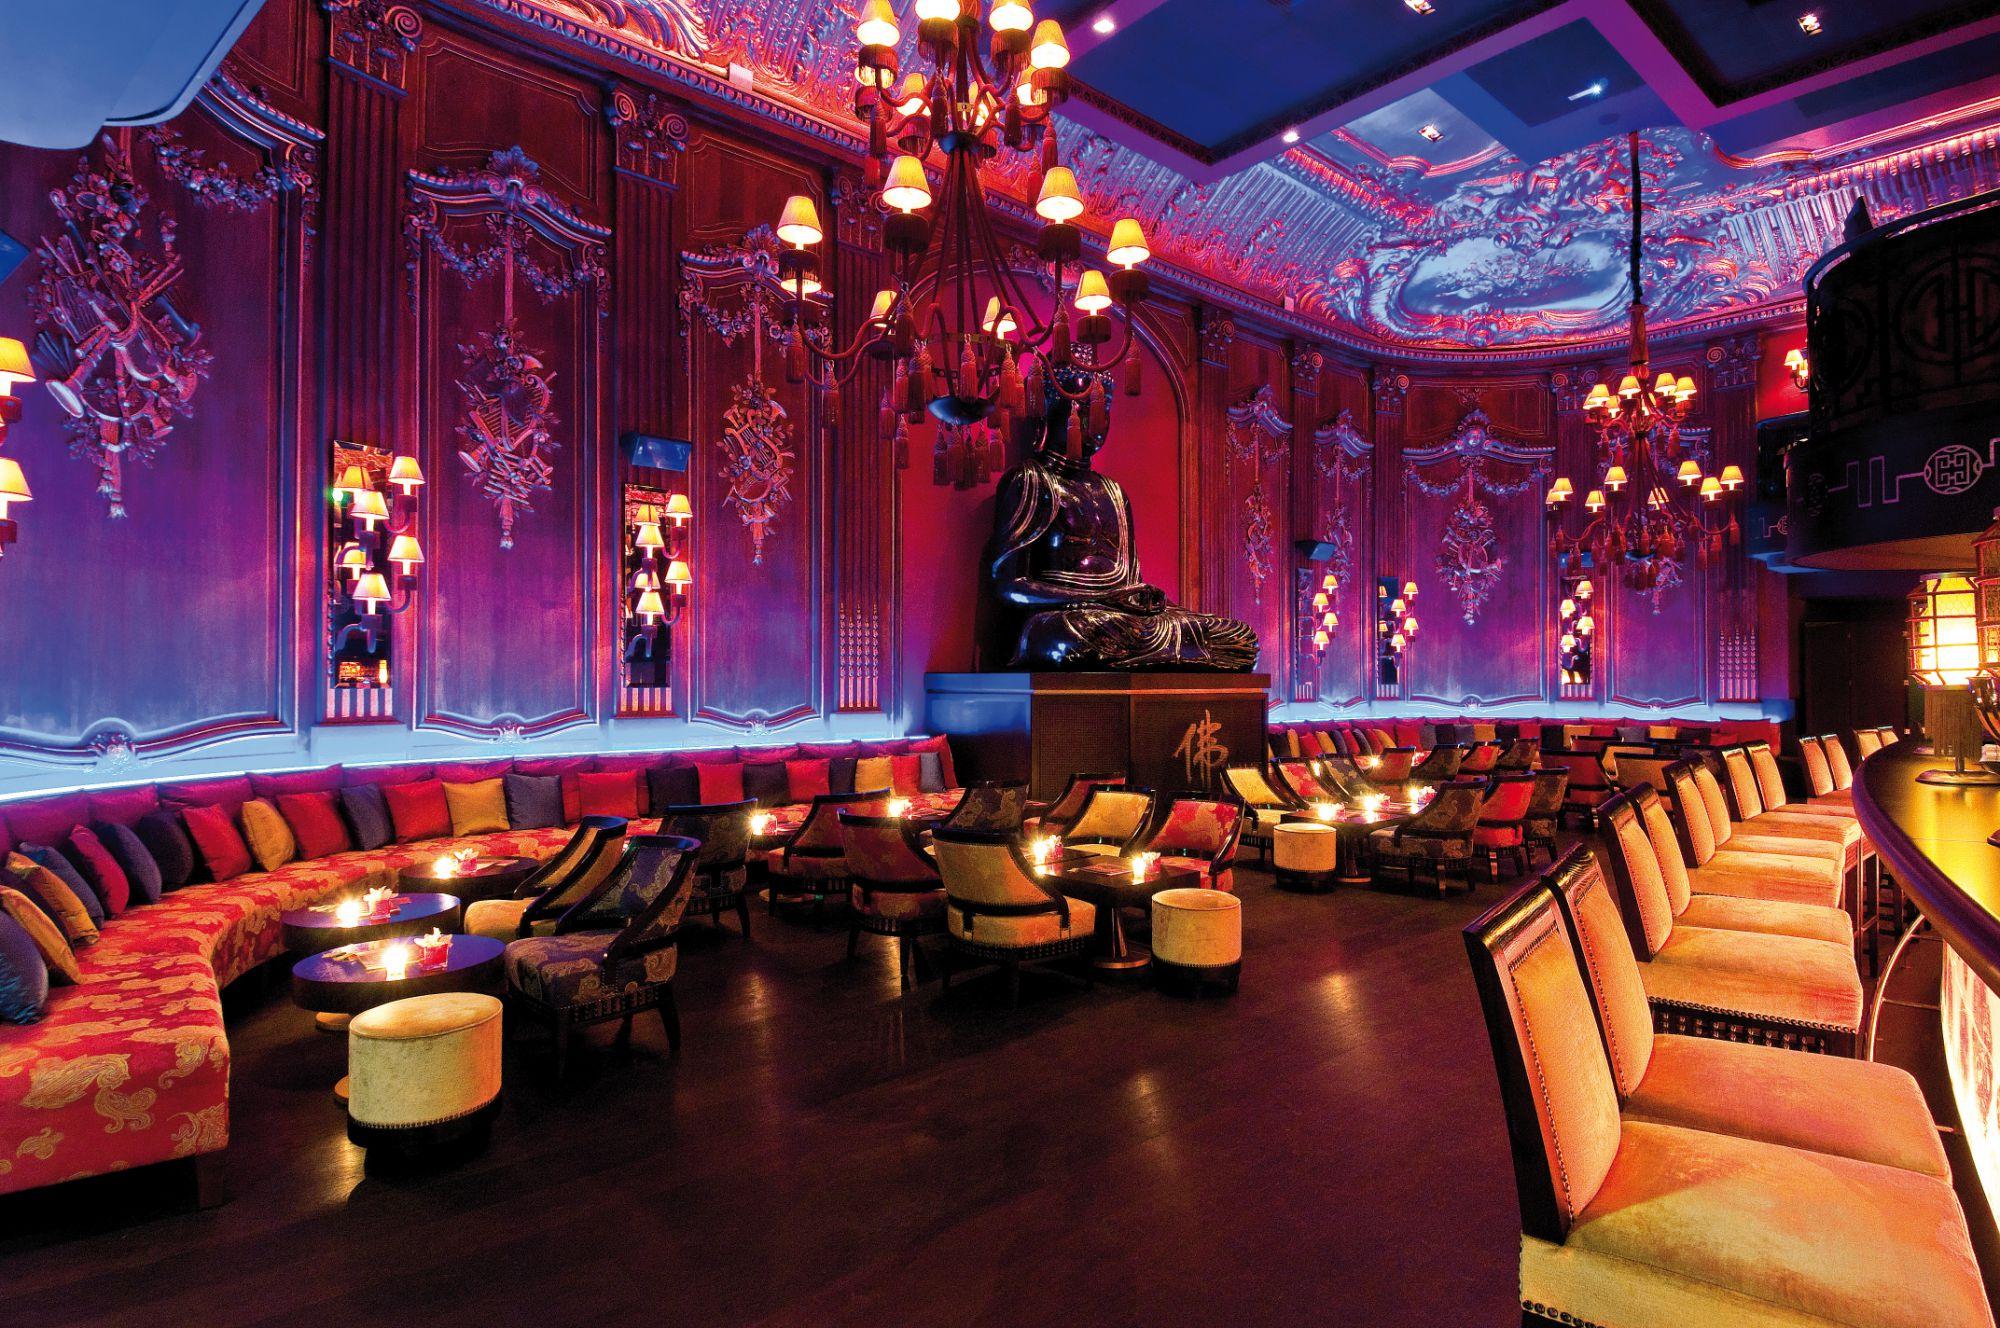 restaurant buddha bar henryot cie manufacture de. Black Bedroom Furniture Sets. Home Design Ideas